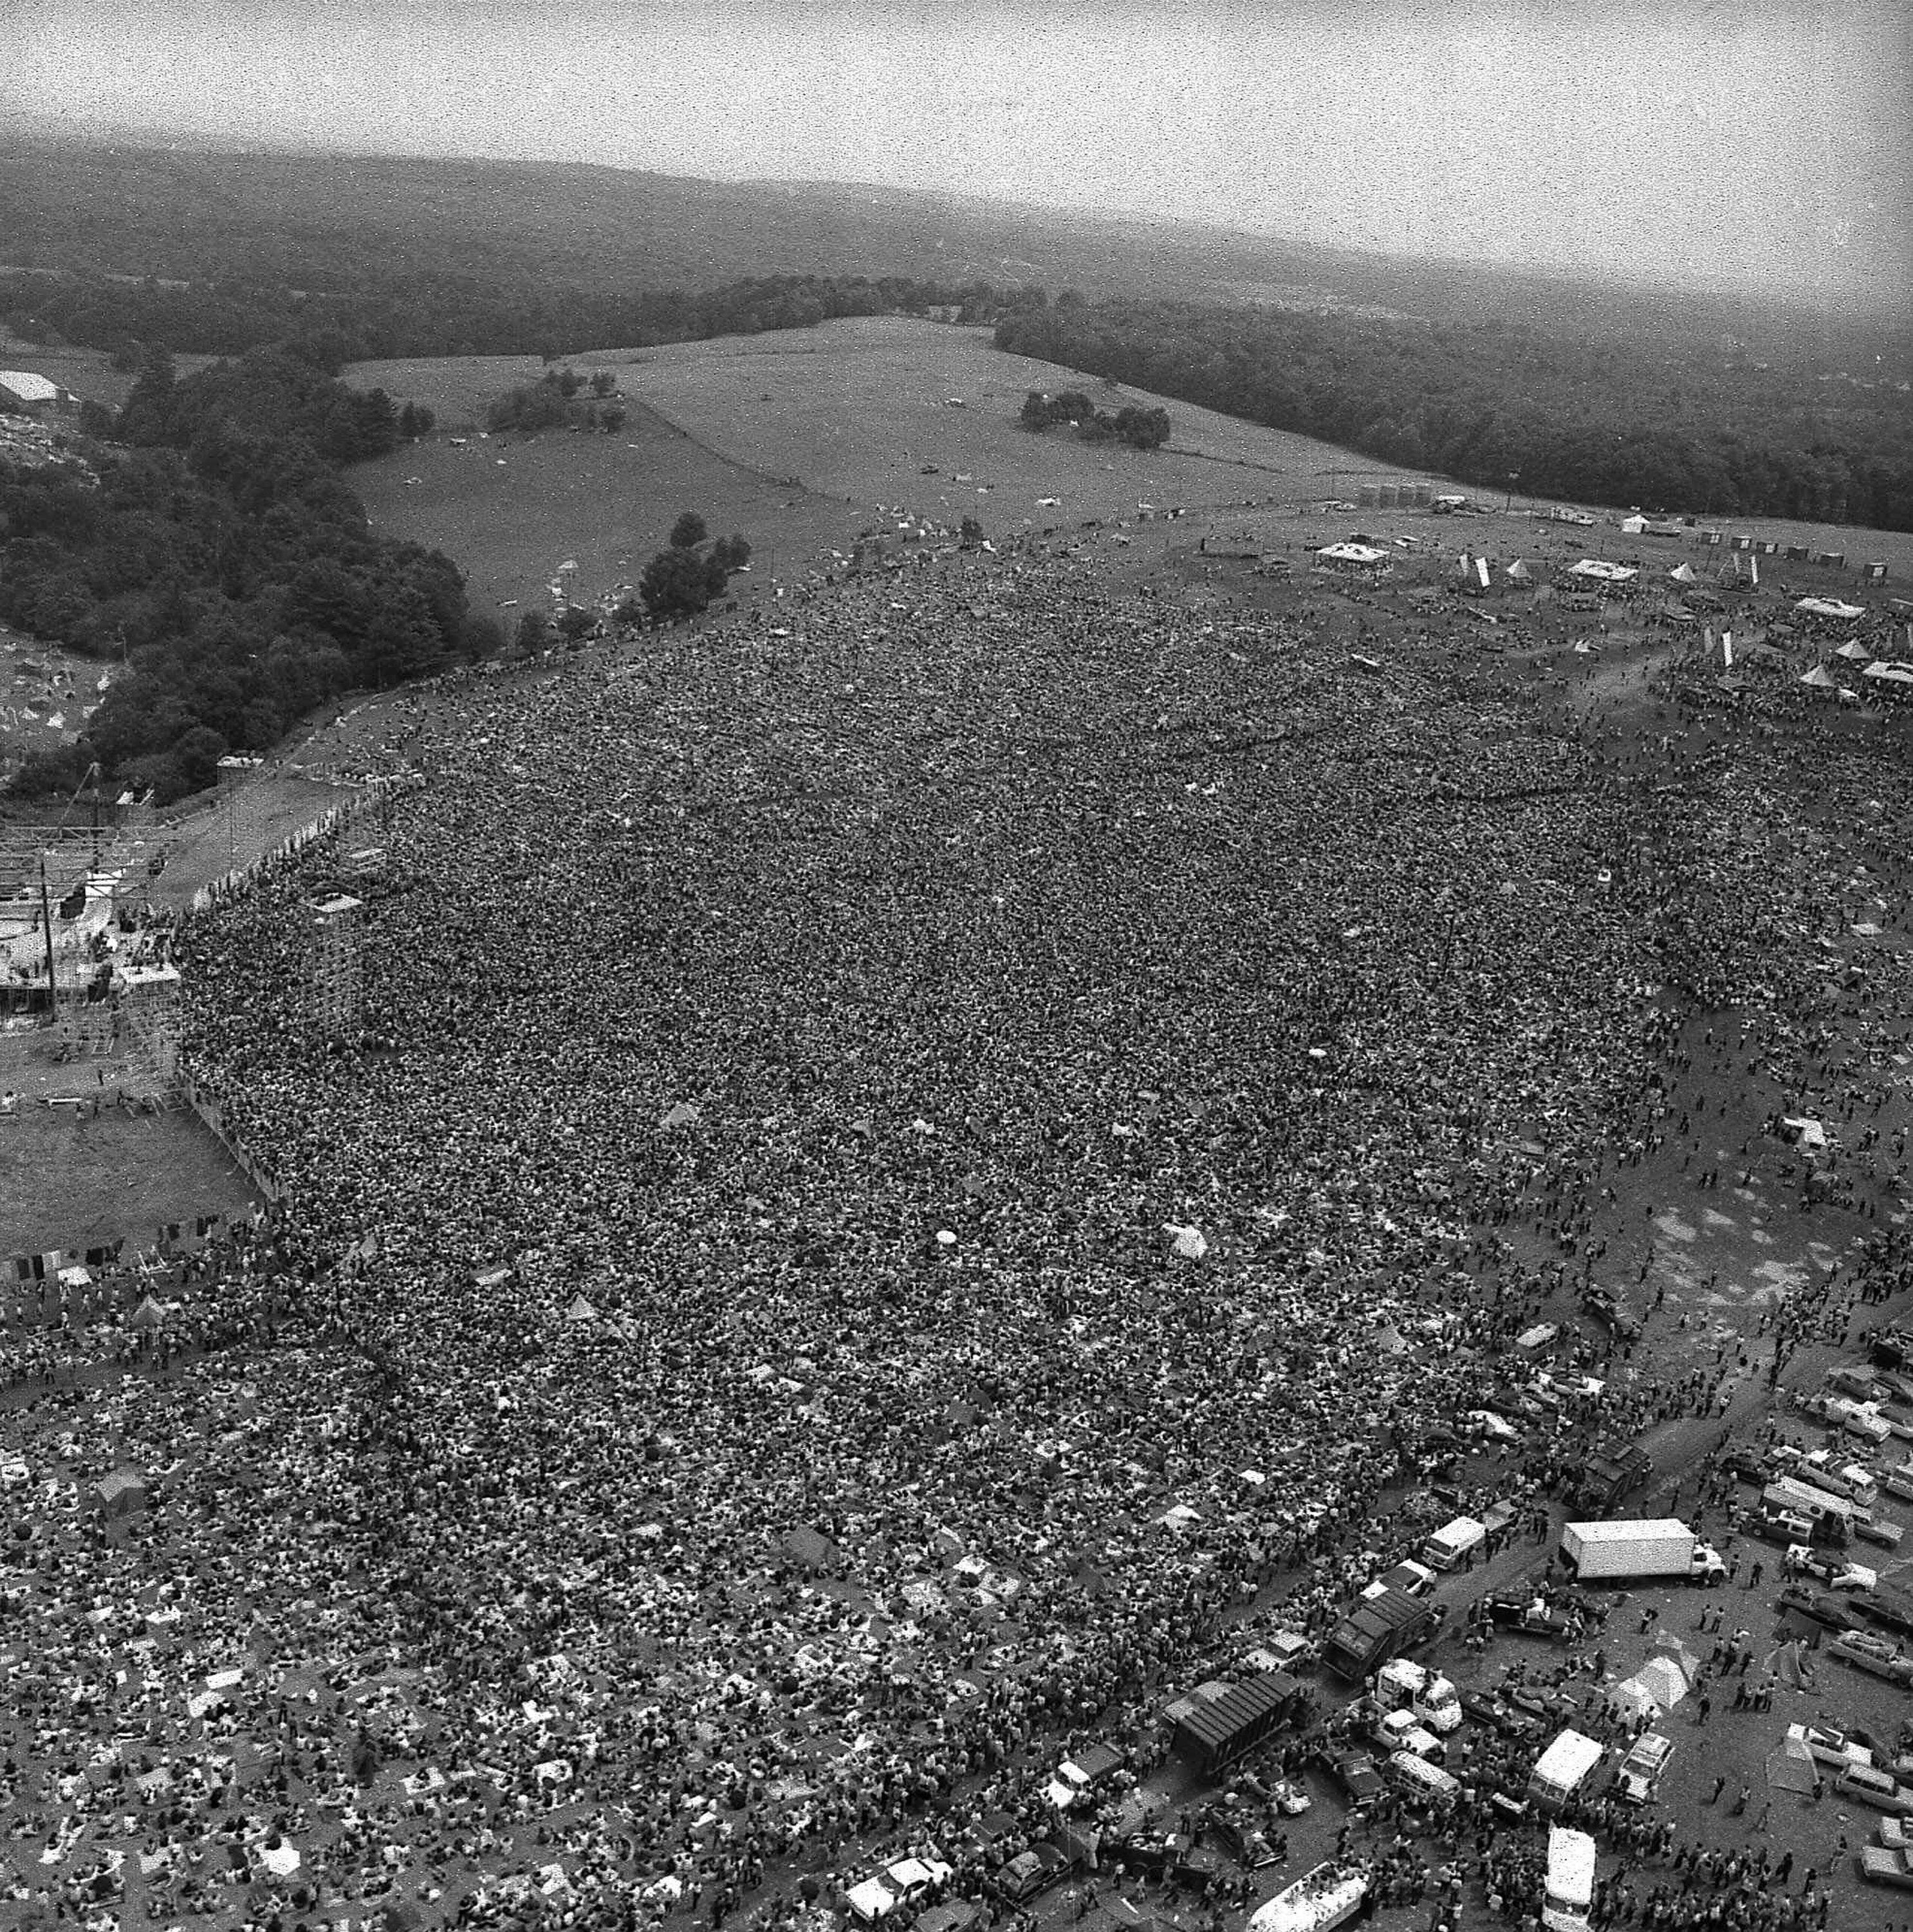 To Woodstockεπιστρέφει εκεί όπου ξεκίνησαν